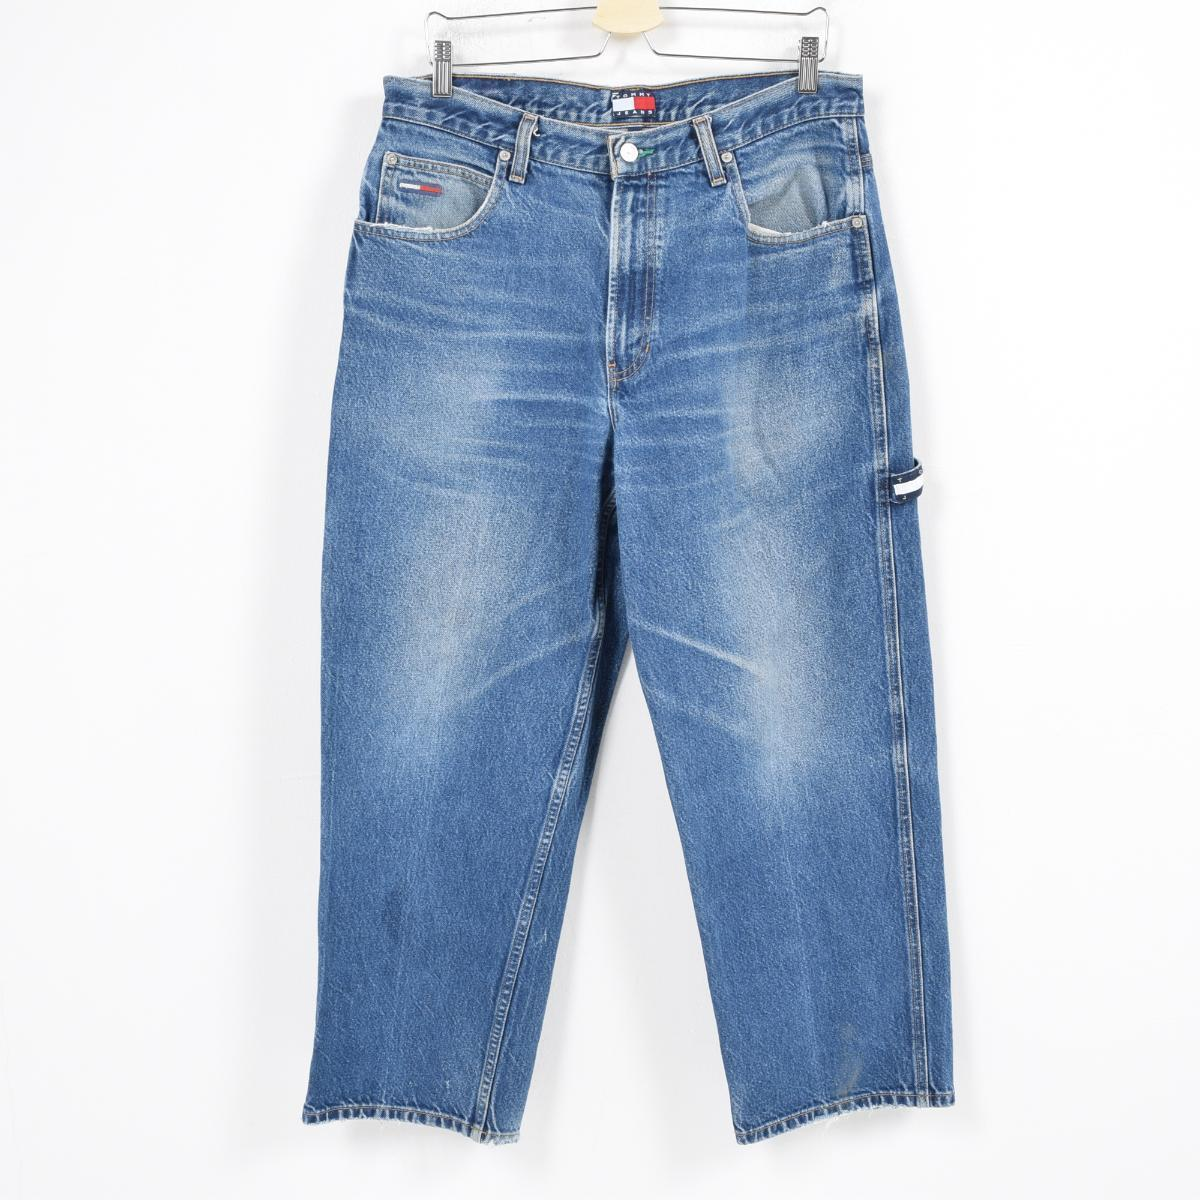 Lady's M(w26) war0194 in the 90s made in ゲス Guess JEANS tapered jeans color denim underwear USA